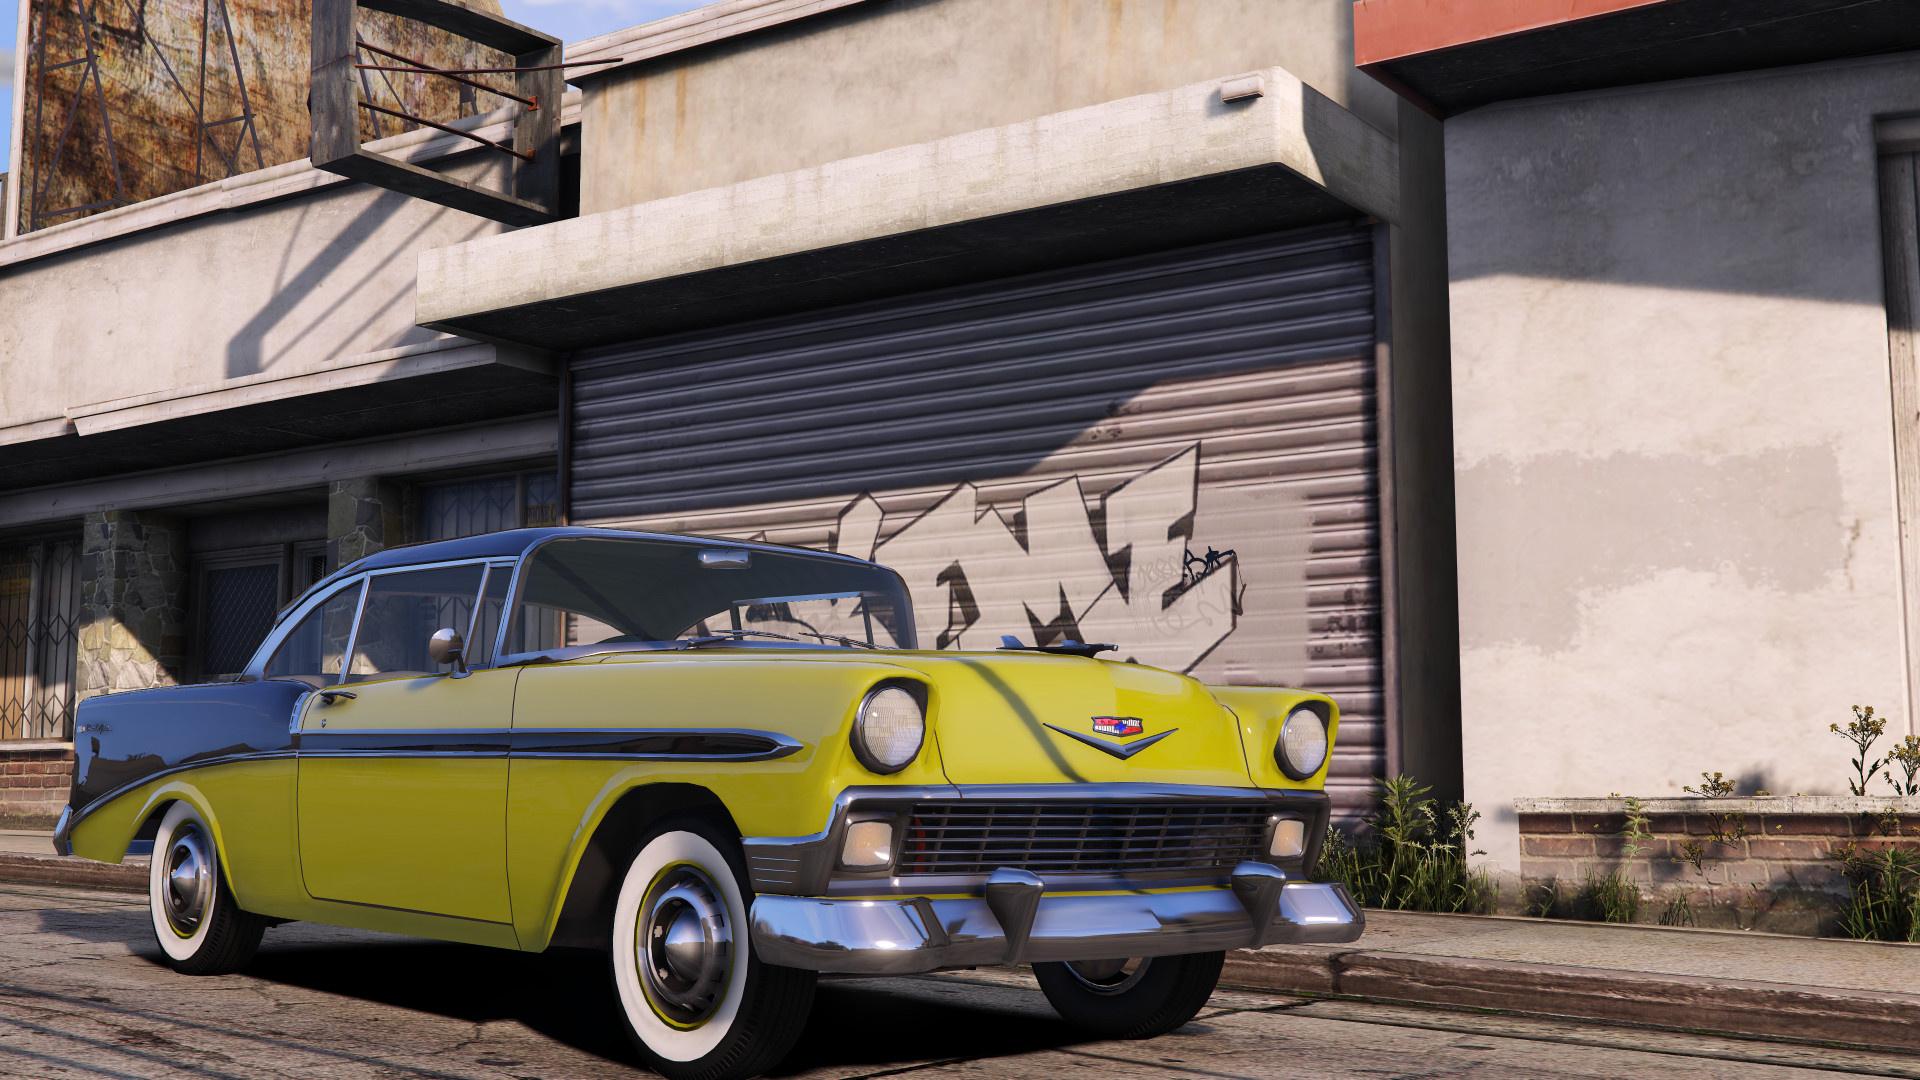 1956 Chevrolet Bel Air Nomad Add On Lods Gta5 Mods Com